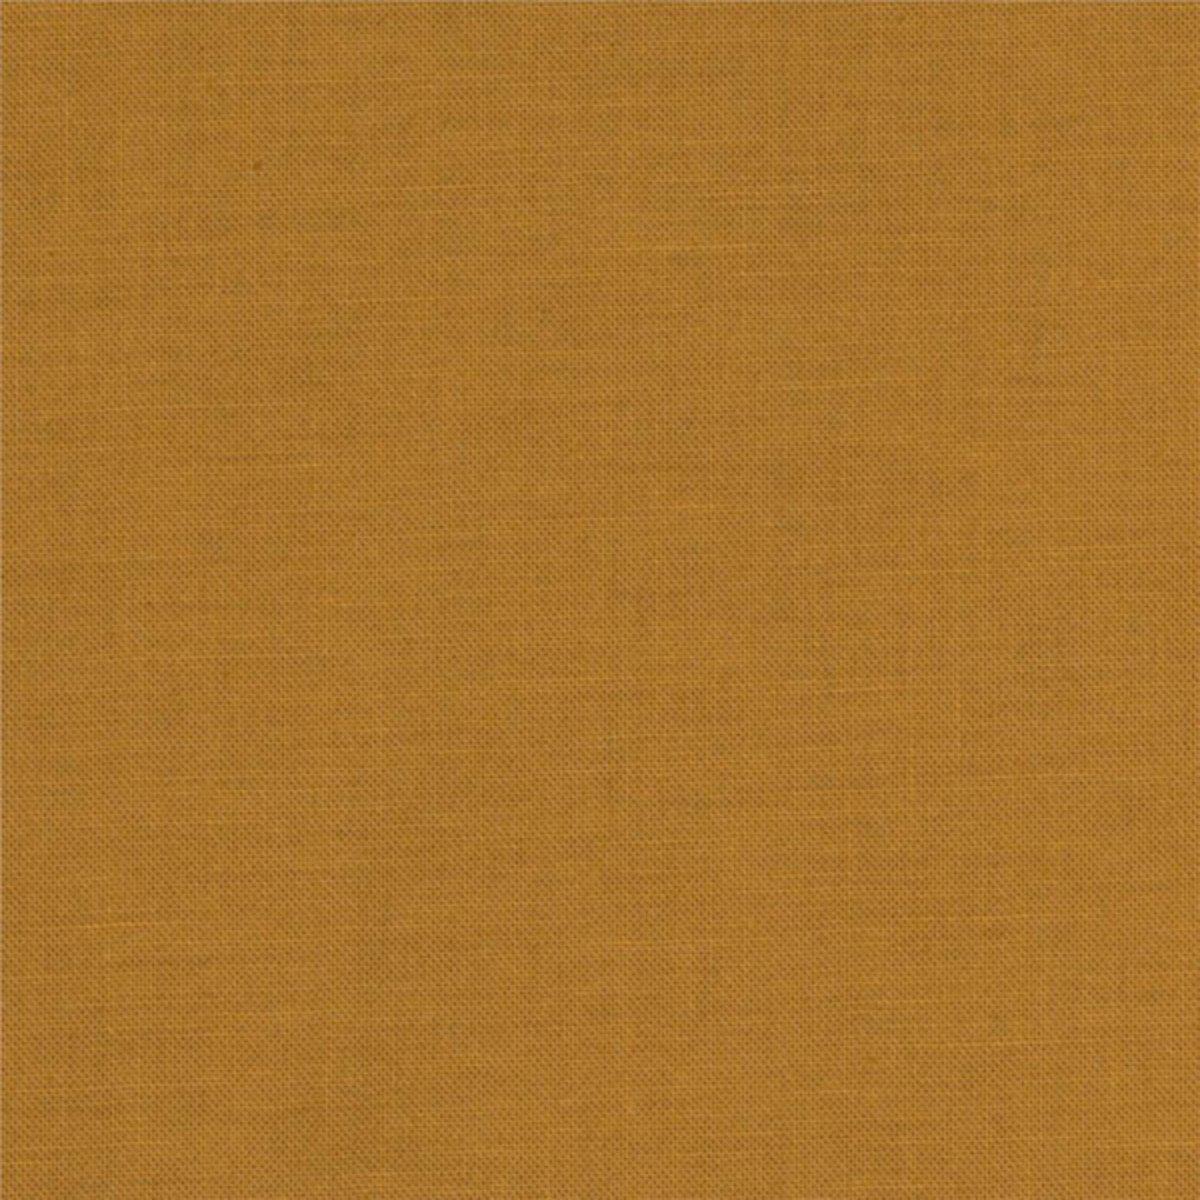 Kona Cotton in Caramel for Robert Kaufman